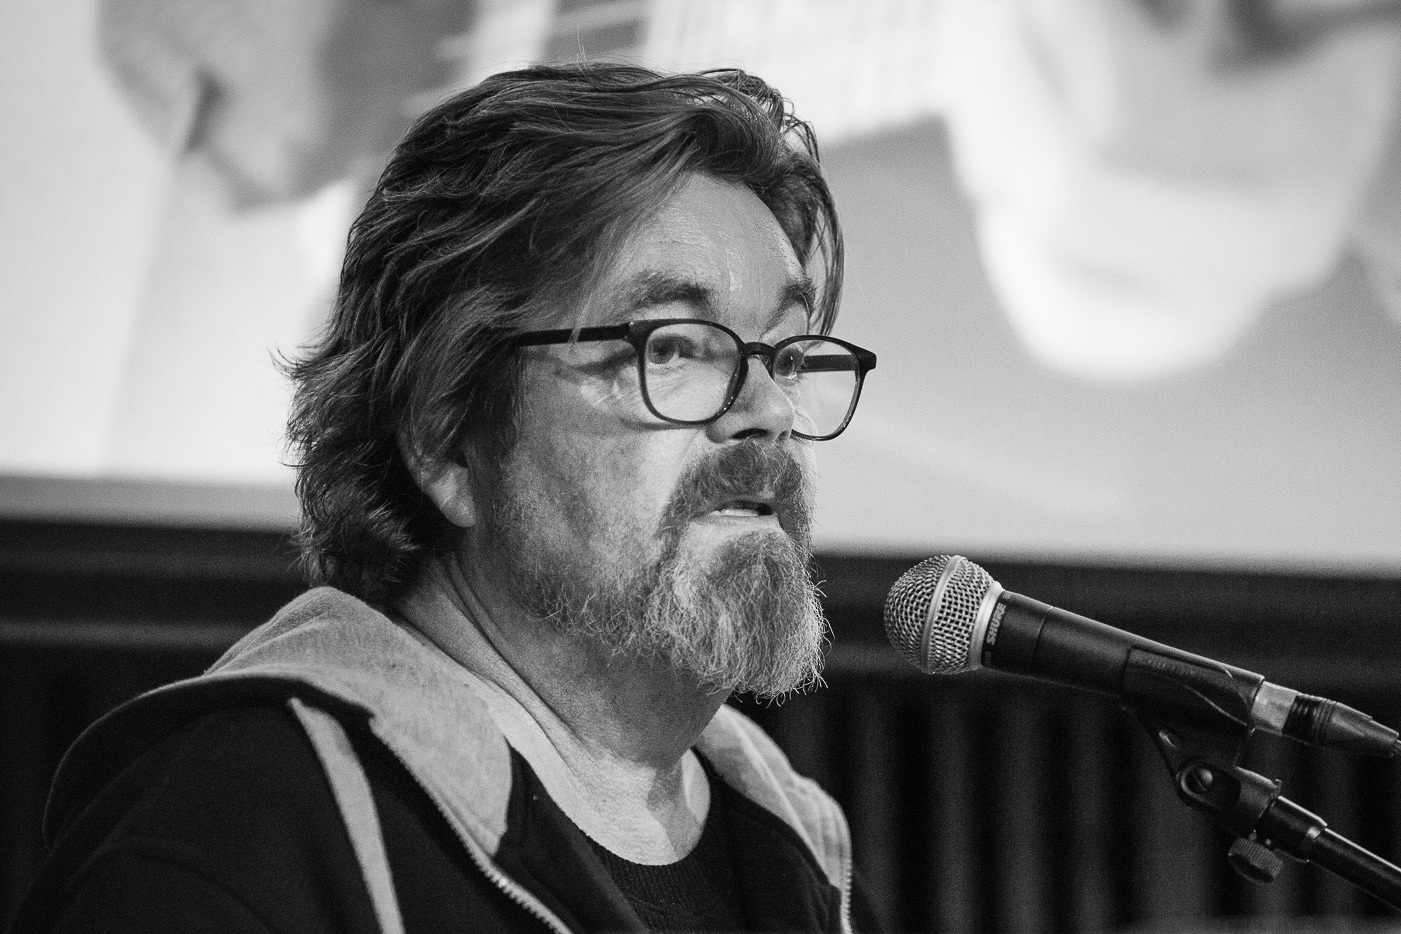 Trond B. Brandal - har 25 års erfaring som rådgiver og tvisteløser blant annet i kontraktspørsmål i henholdsvis Norsk Musikerforbund, MFO og Creo. Før han begynte med det, var han utøvende musiker.